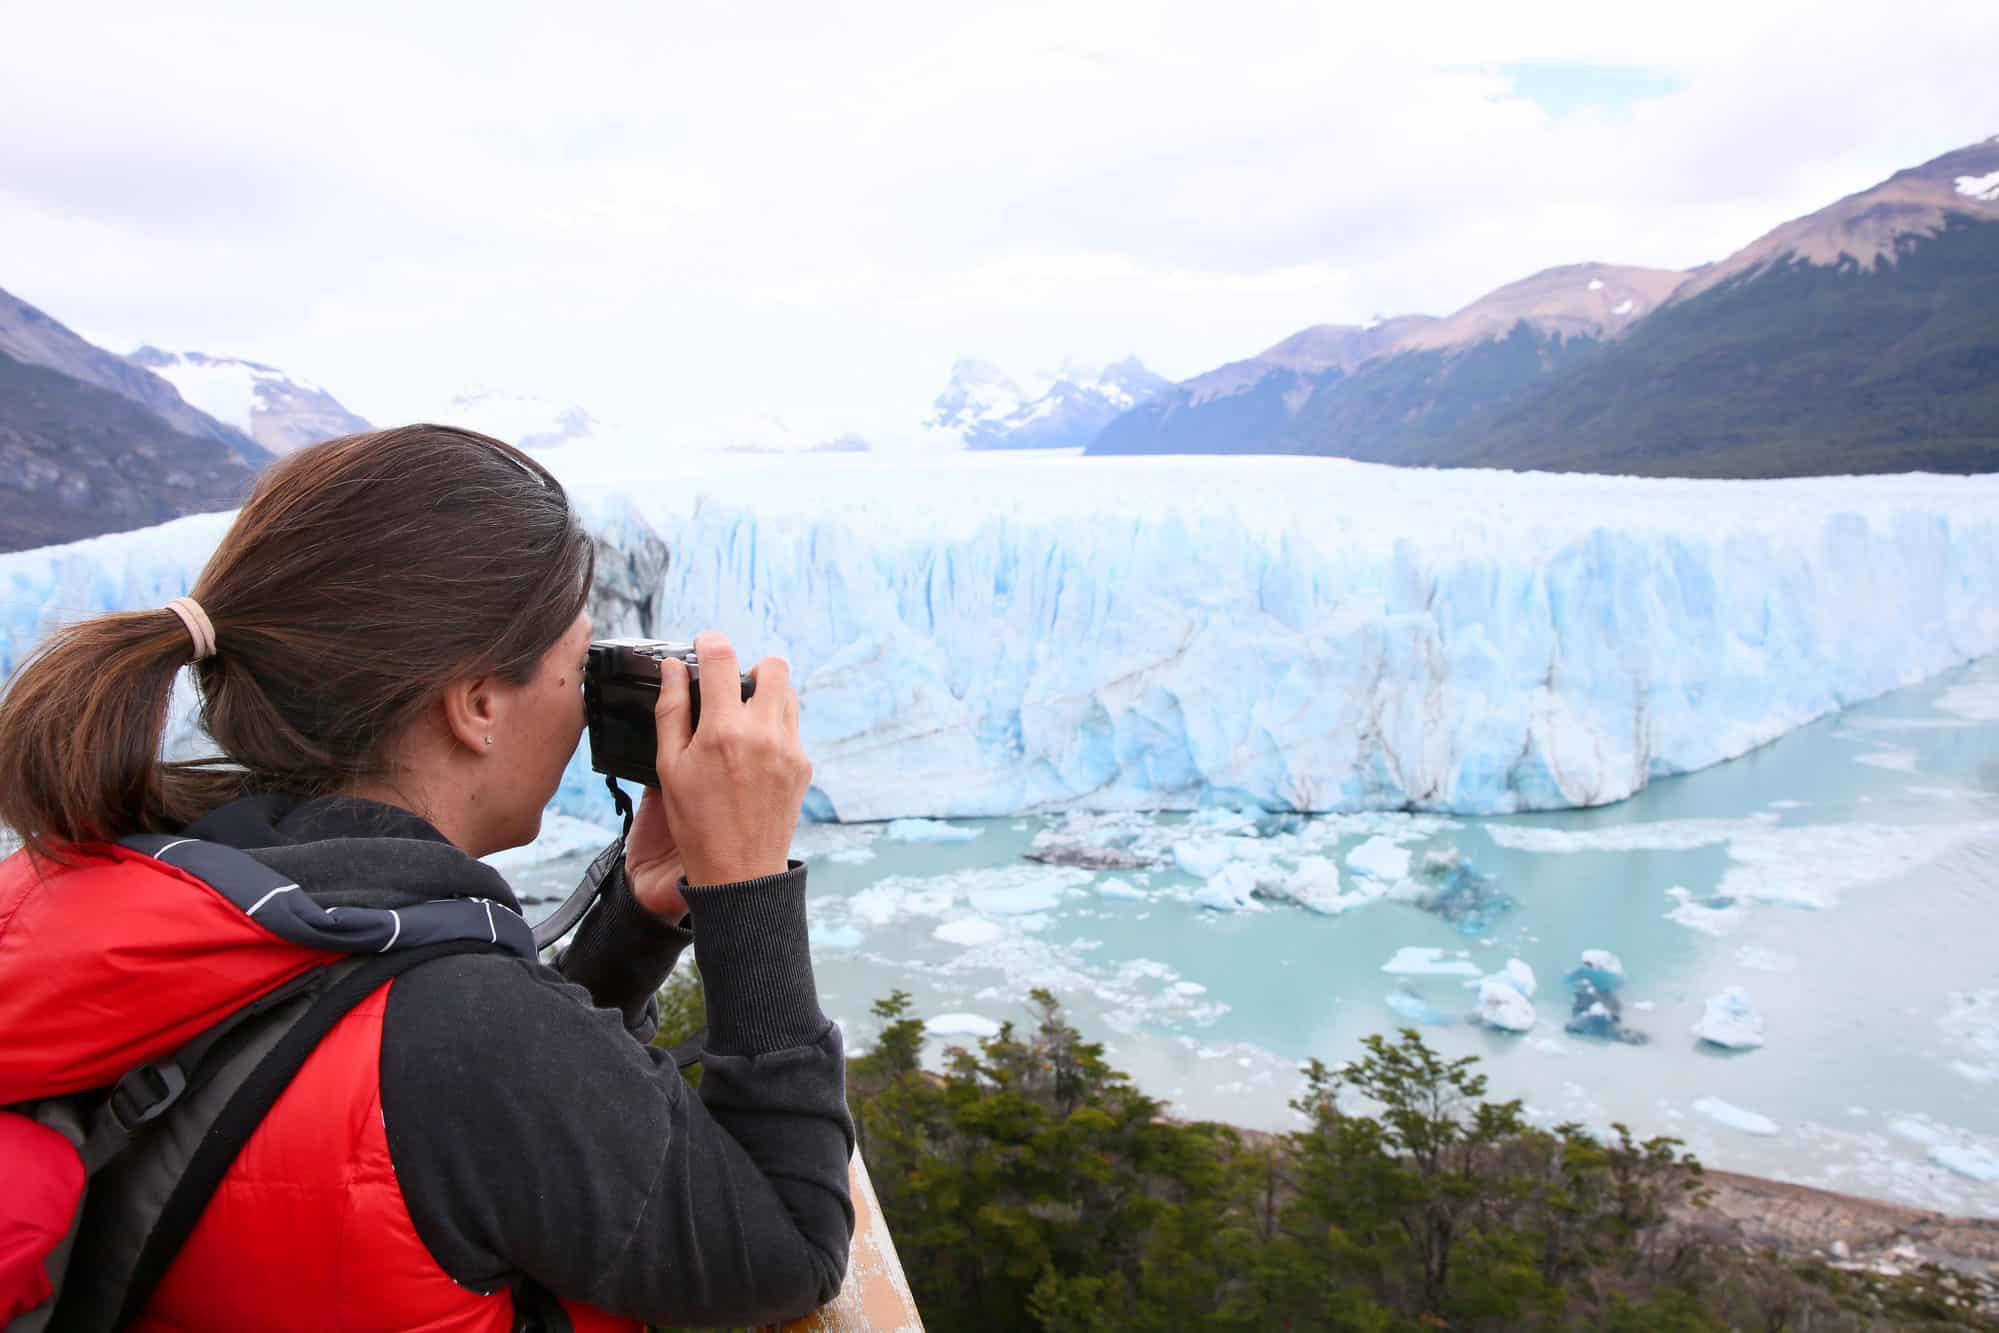 Mujer turista fotografiando glaciar de Perito Moreno en Argentina